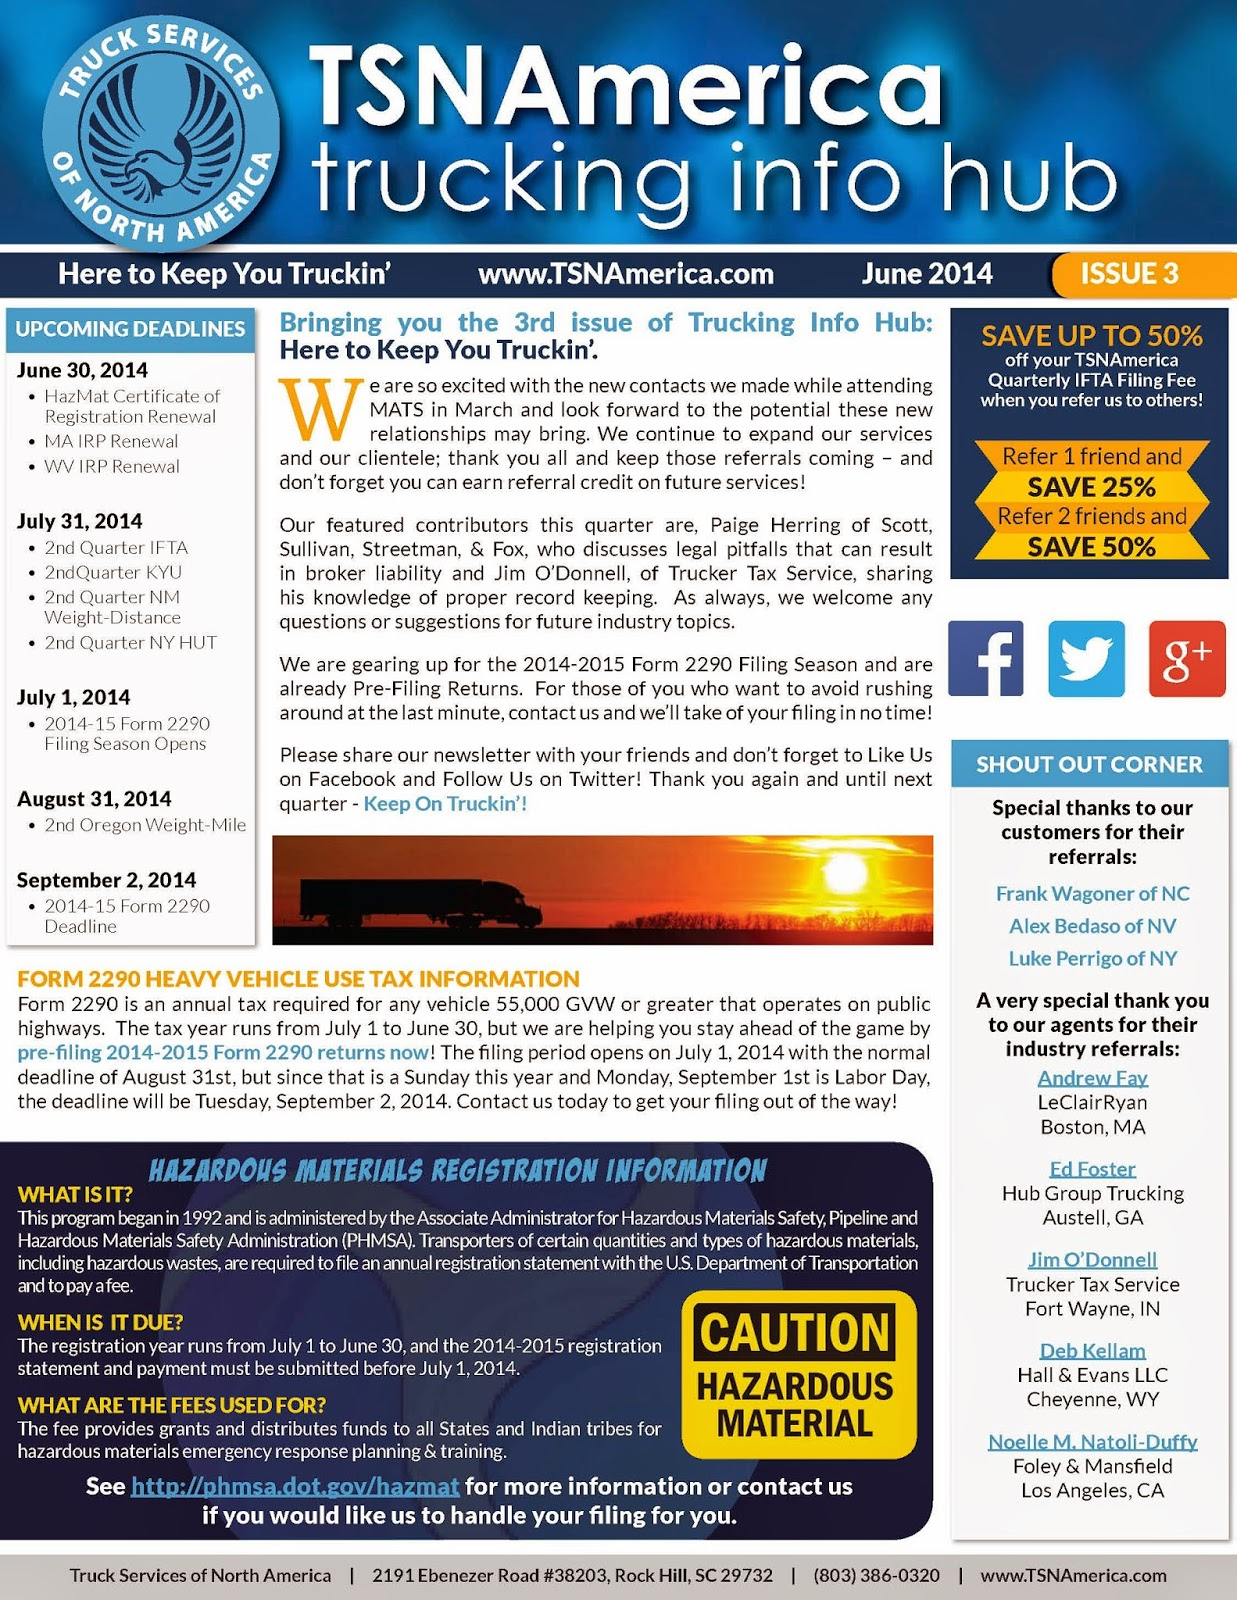 http://www.tsnamerica.com/docs/Issue3TSNANL6_14.pdf